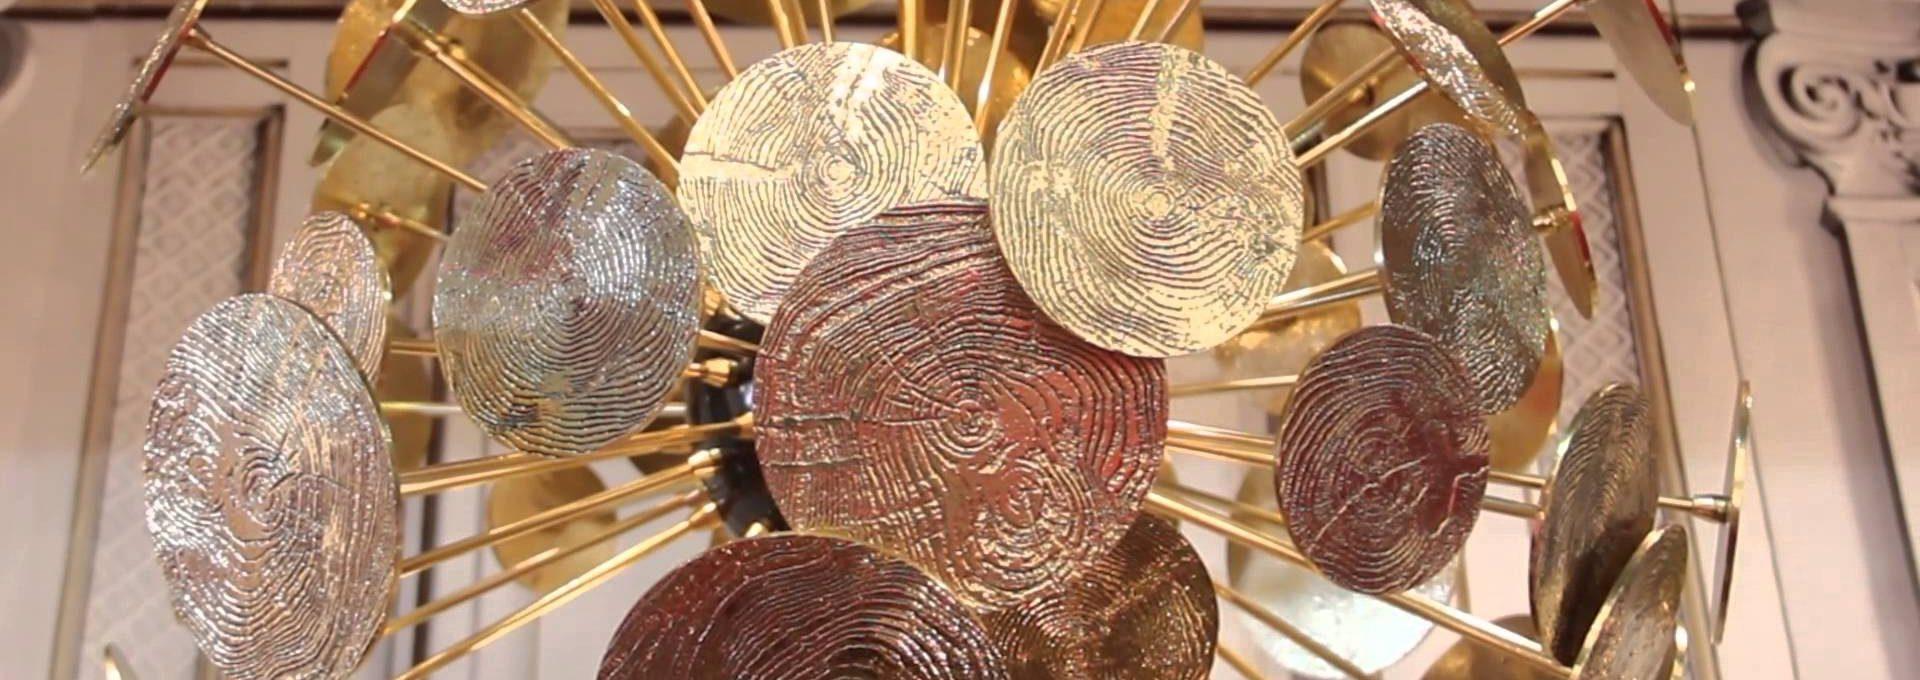 Dicas de decoración Dicas de decoración: Muebles de estilo Contemporáneo de Boca do Lobo 0d1f477bade5e2683a954fe877481dc8 1920x680